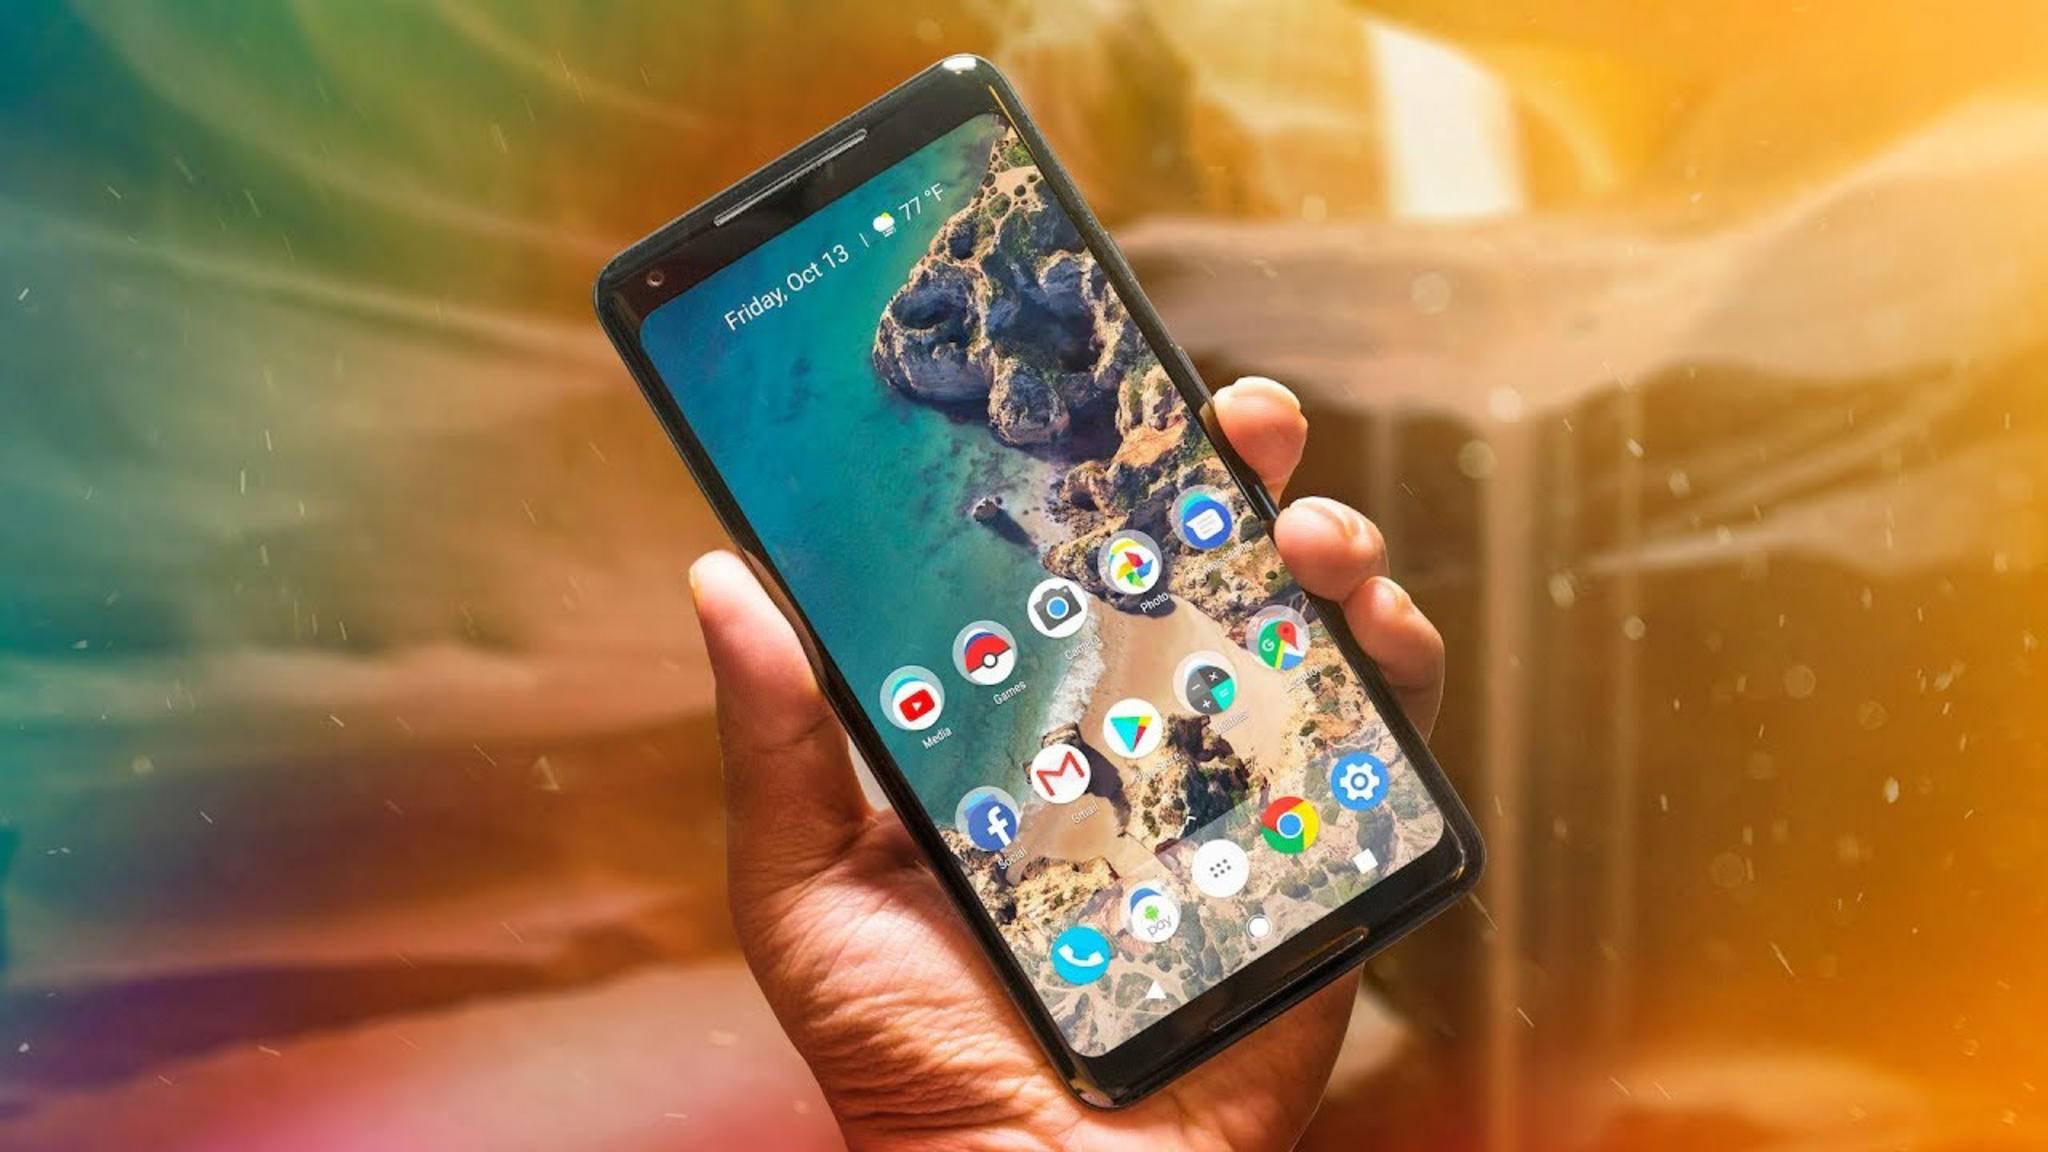 Die Pixel-2-Smartphones knipsen dank eines Updates bald schärfere Fotos.